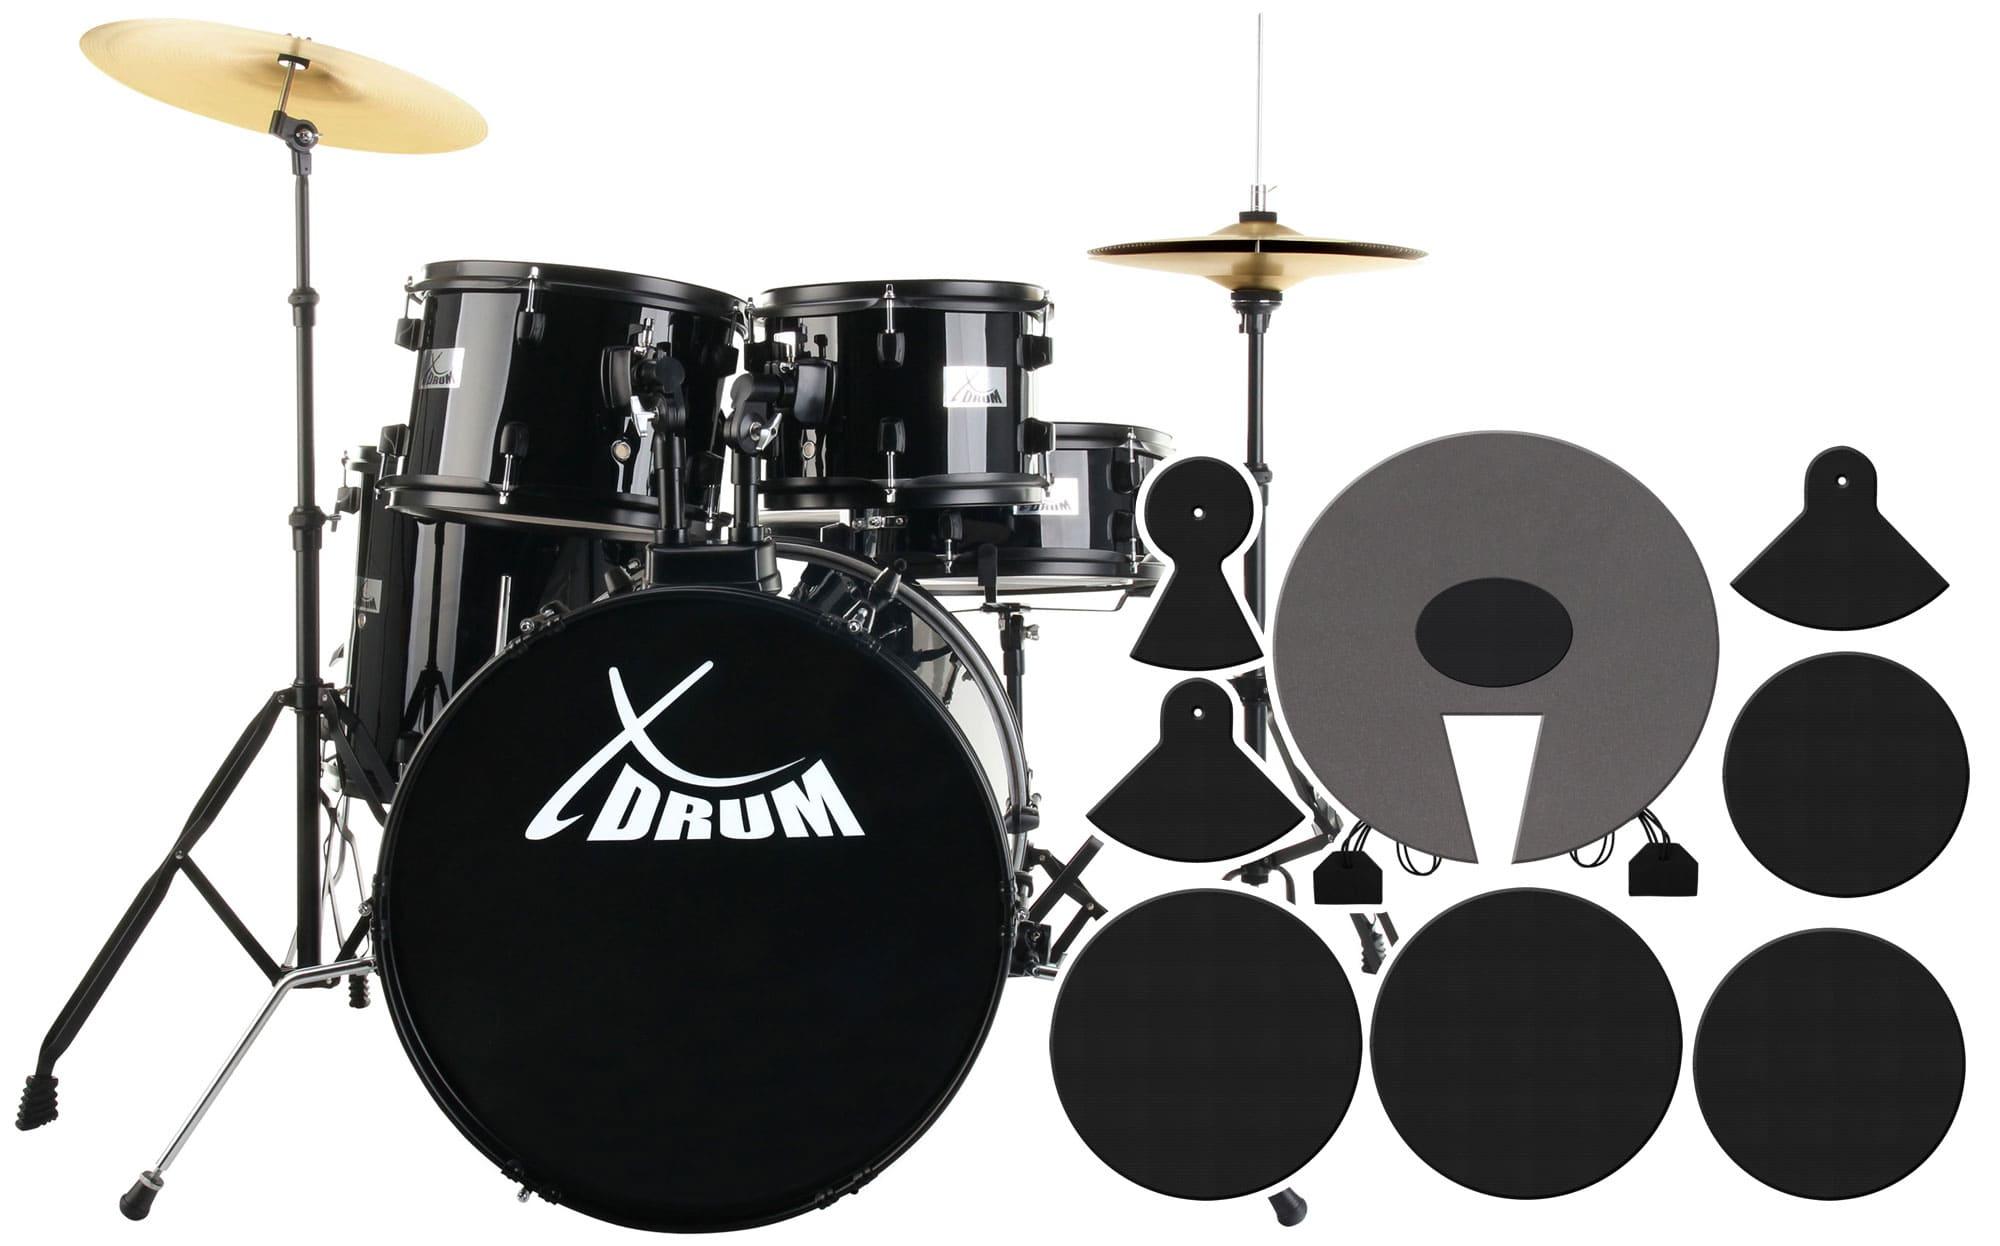 Xdrum Rookie 20 Quot Studio Drums Black Plus Damper Set